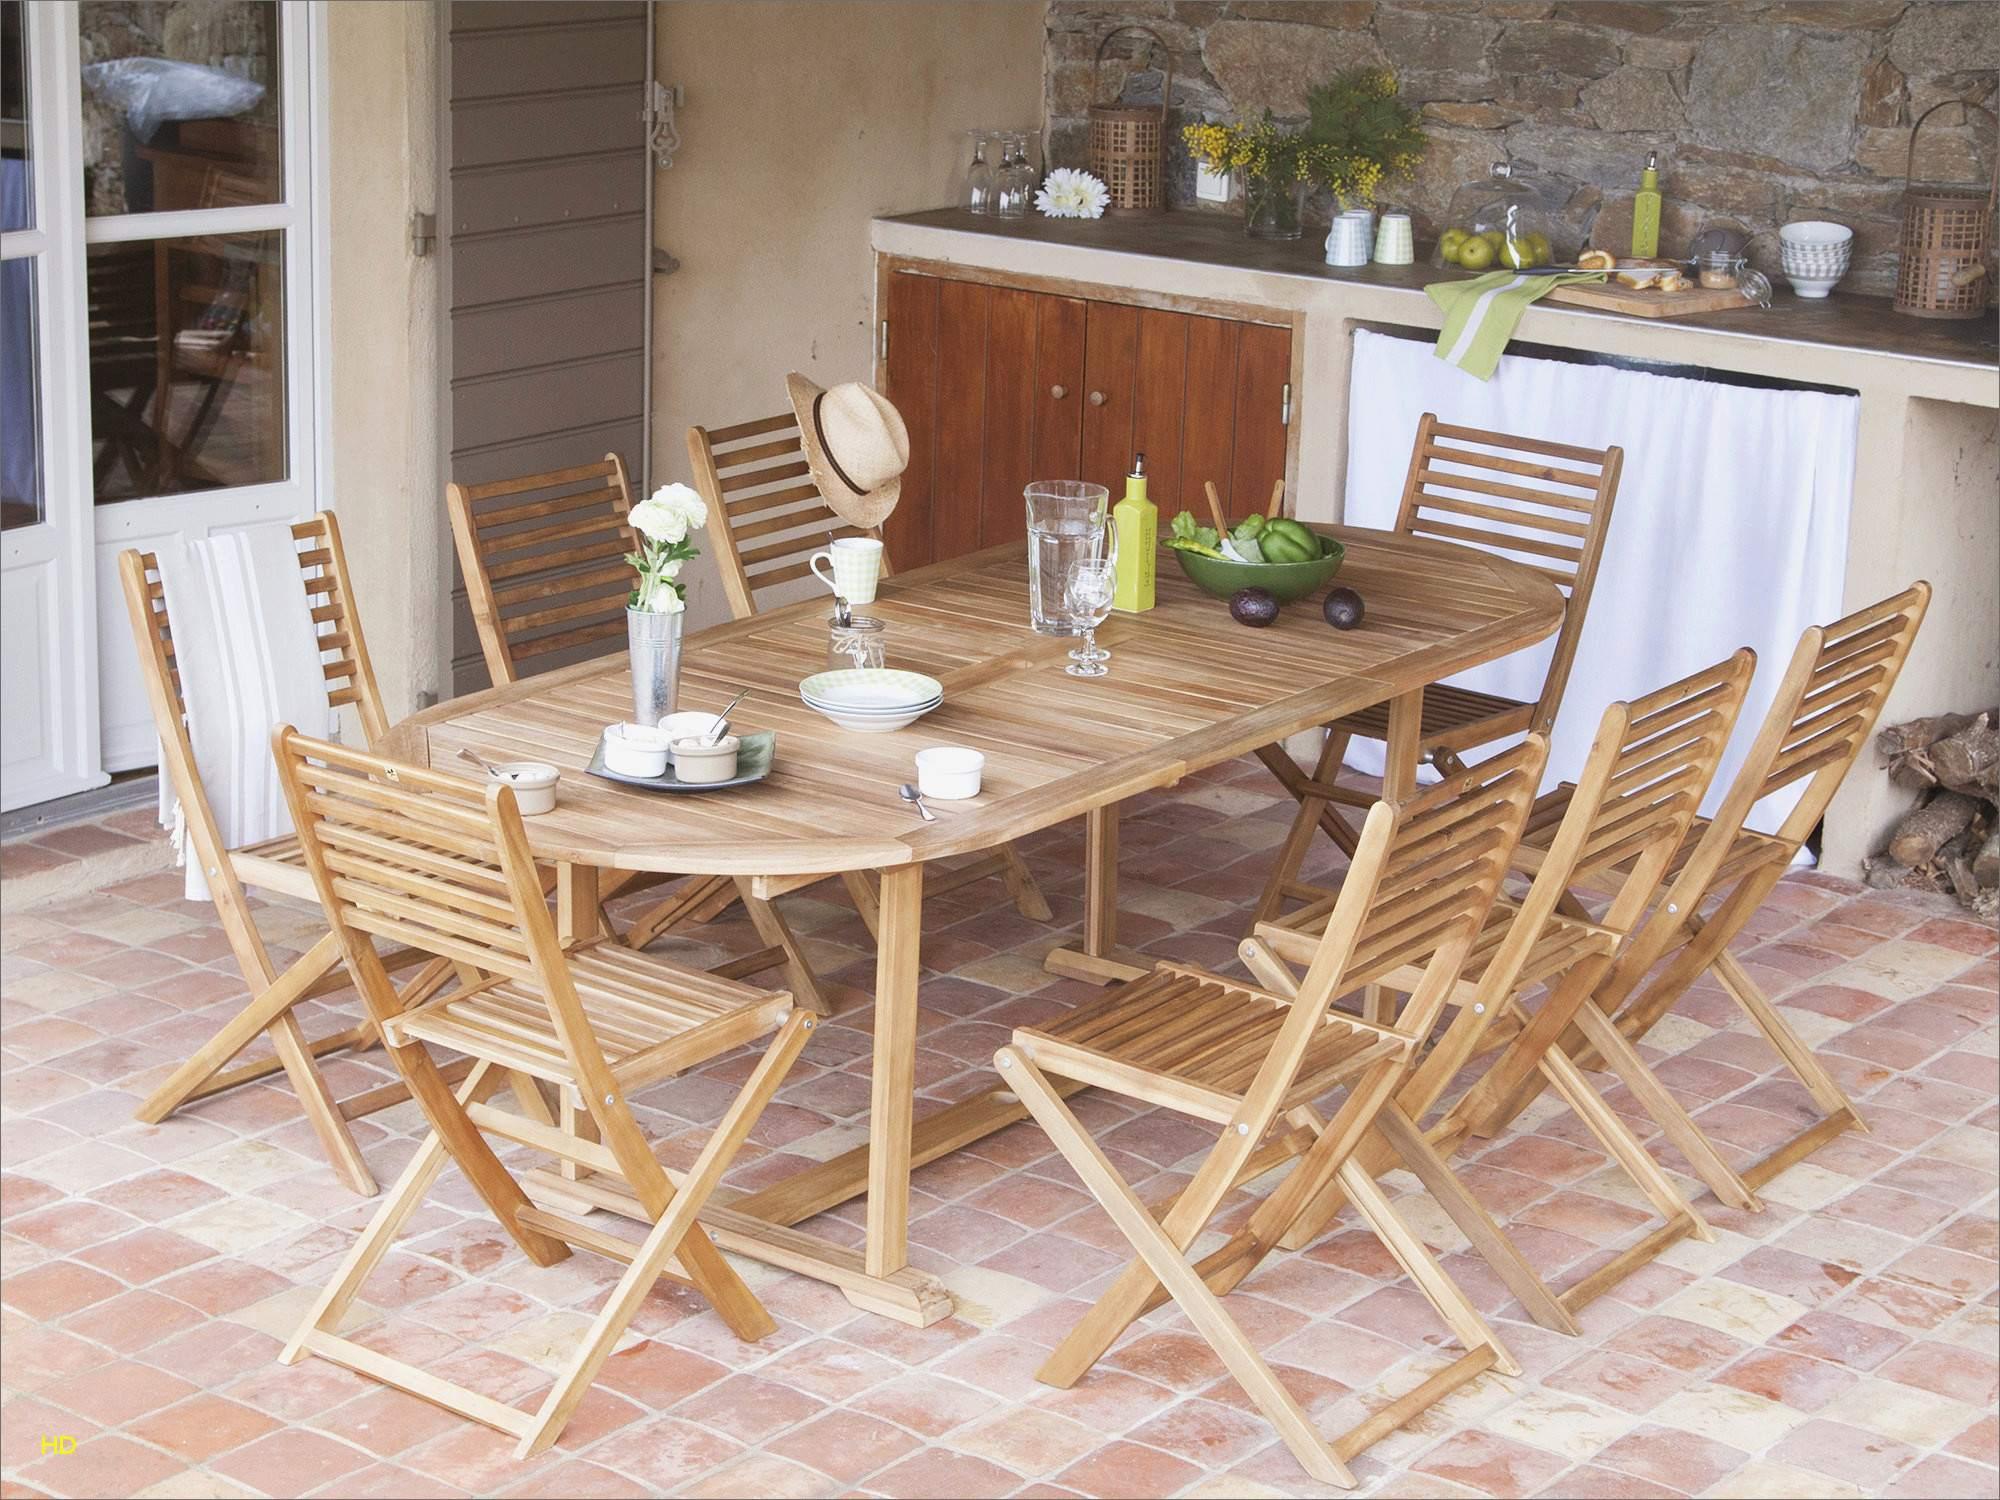 Table De Jardin Intermarche Inspirant Galerie 44 Luxe Le Bon Coin Salon De Jardin Fer forge